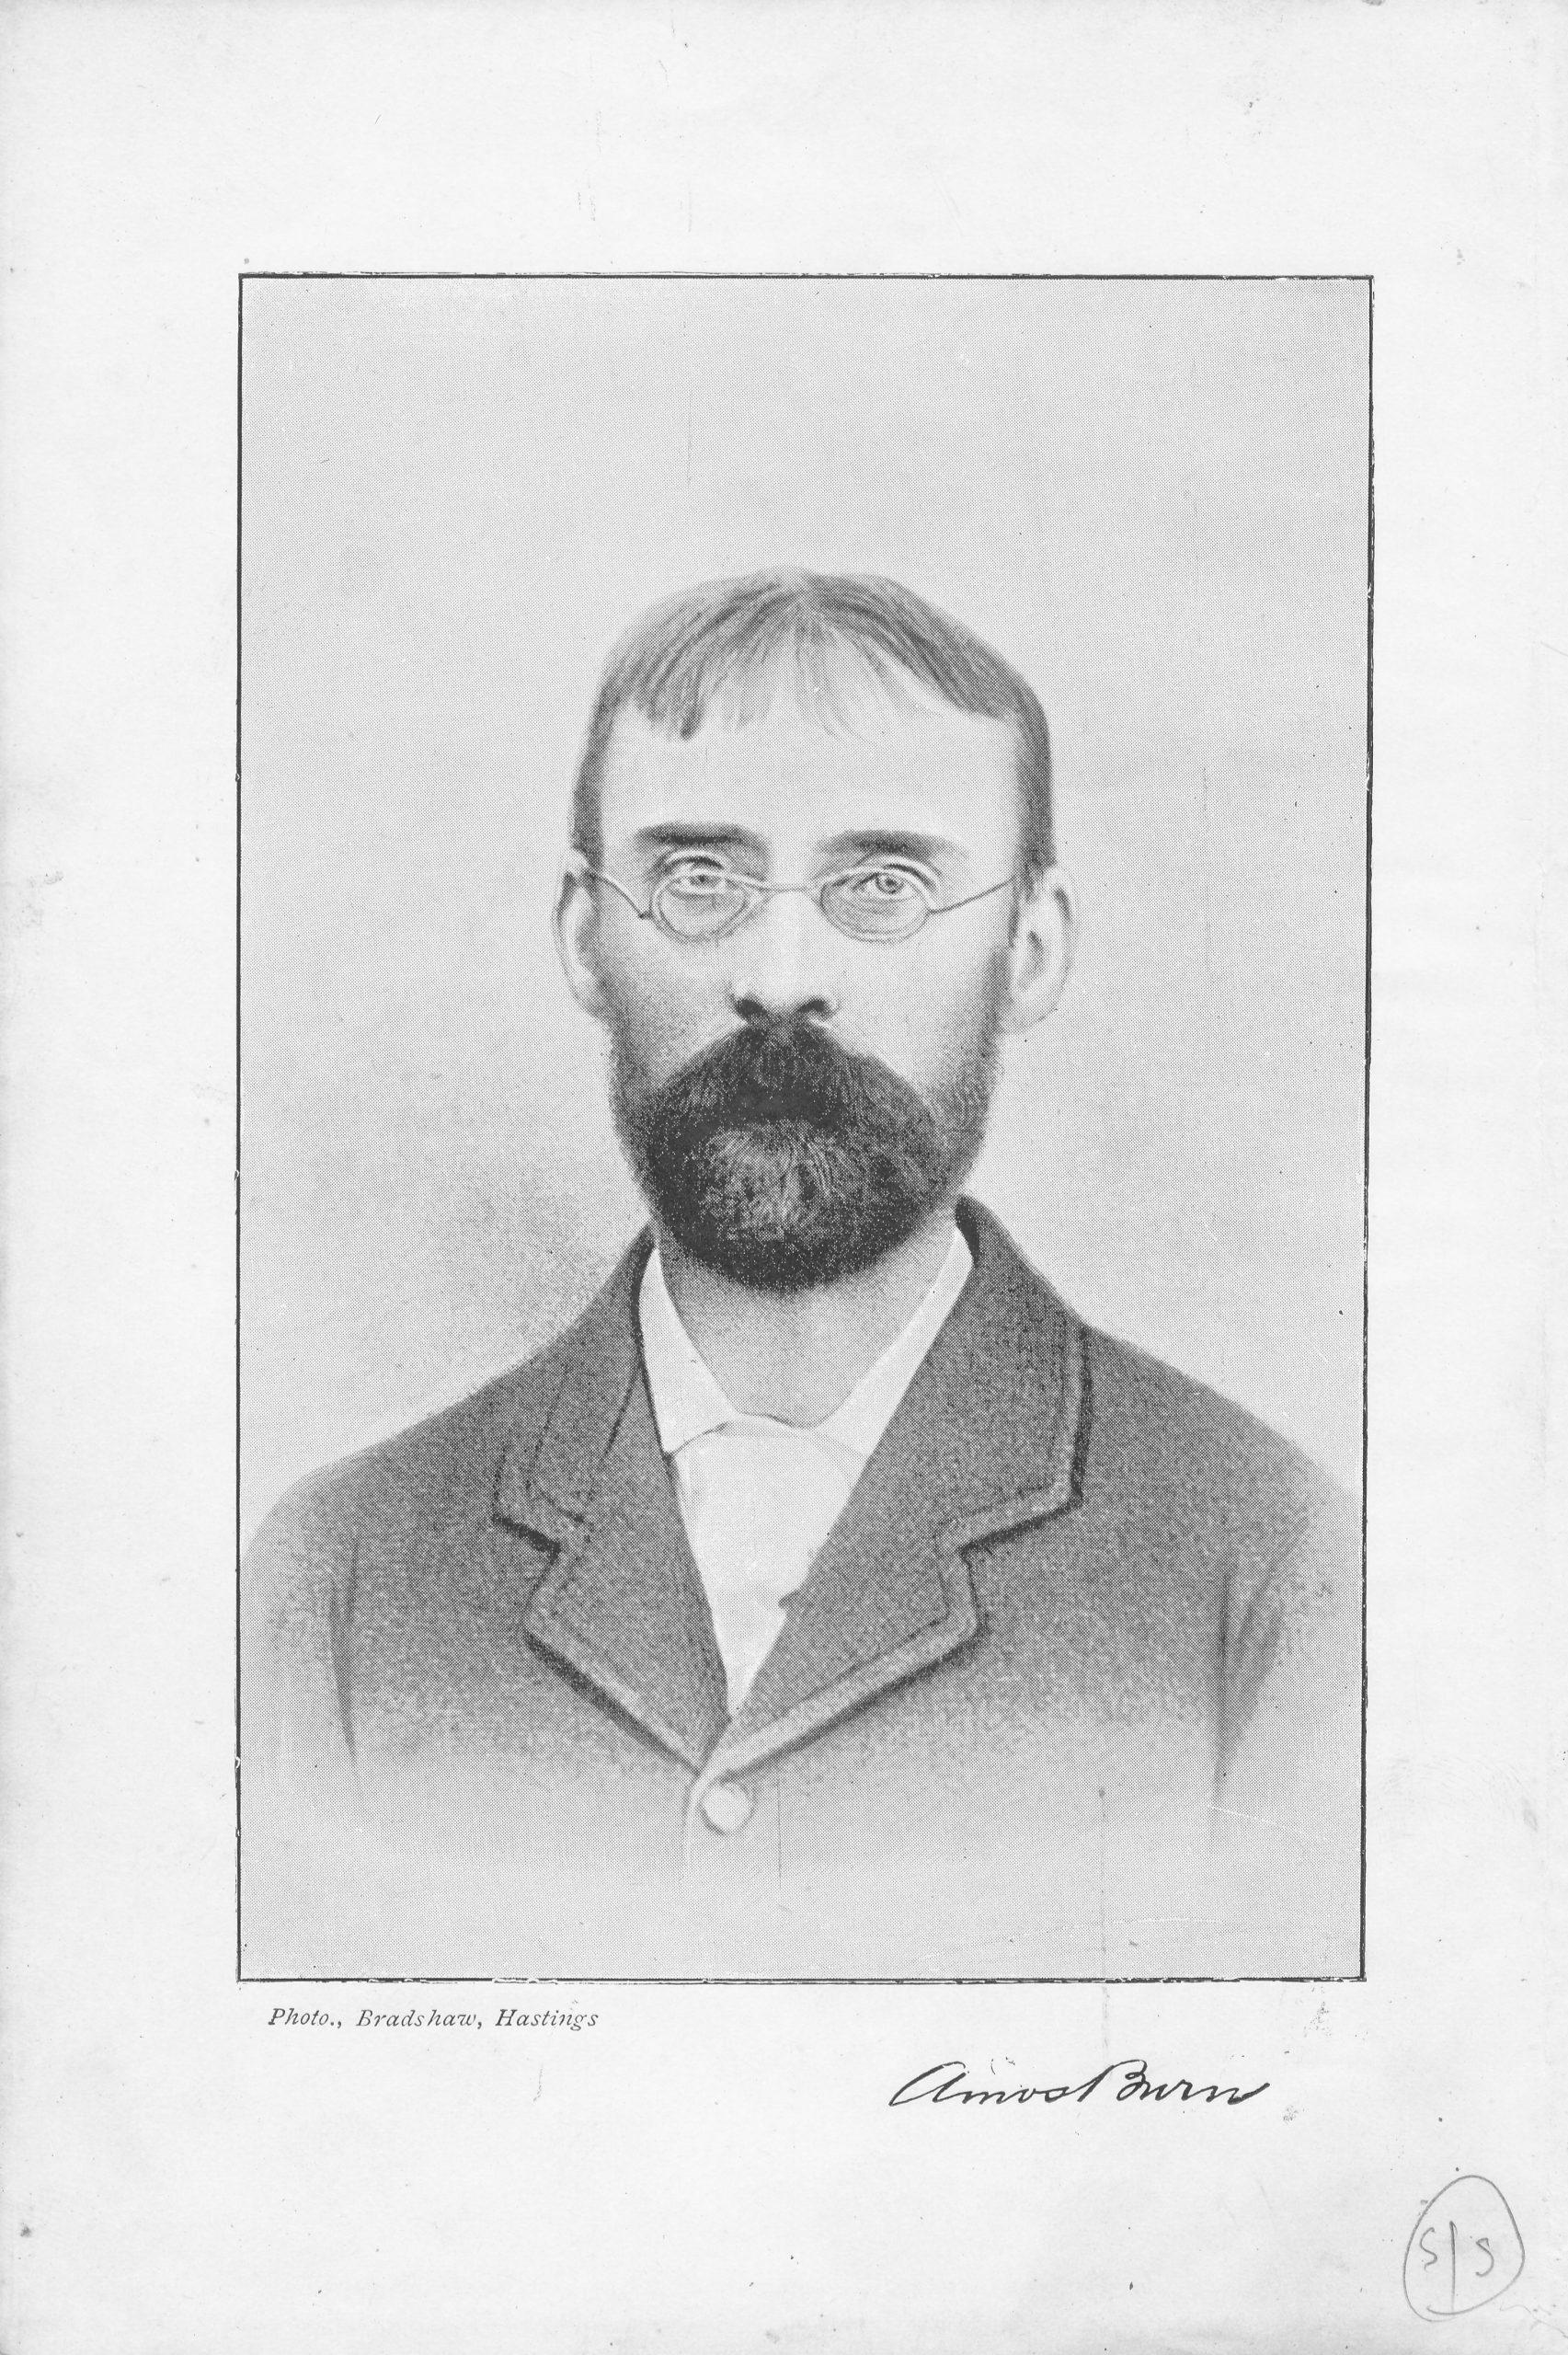 Amos Burn (31-XII-1848, 25-XI-1925)